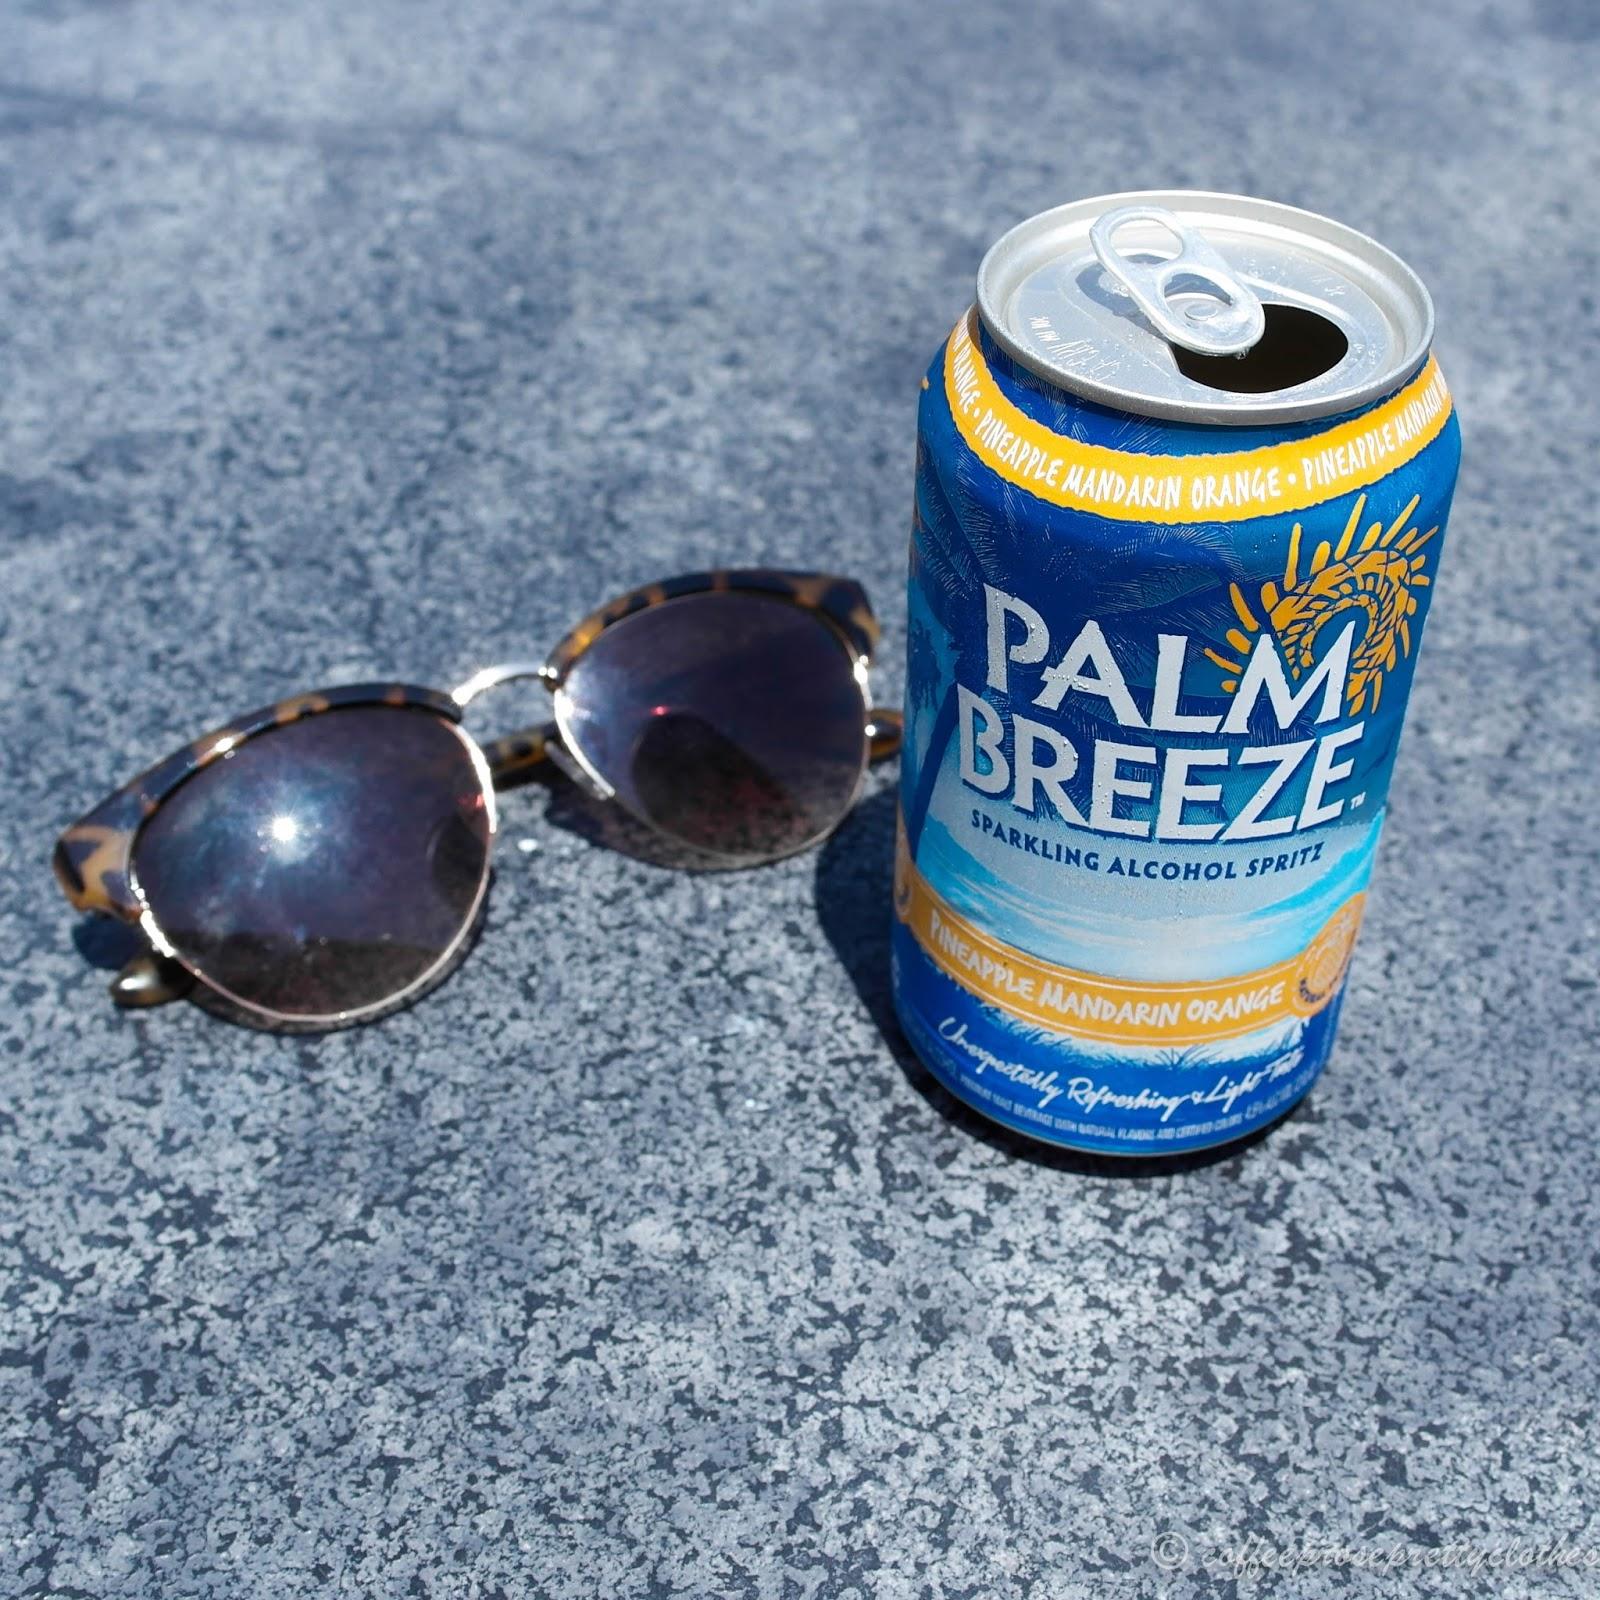 Palm Breeze flatlay